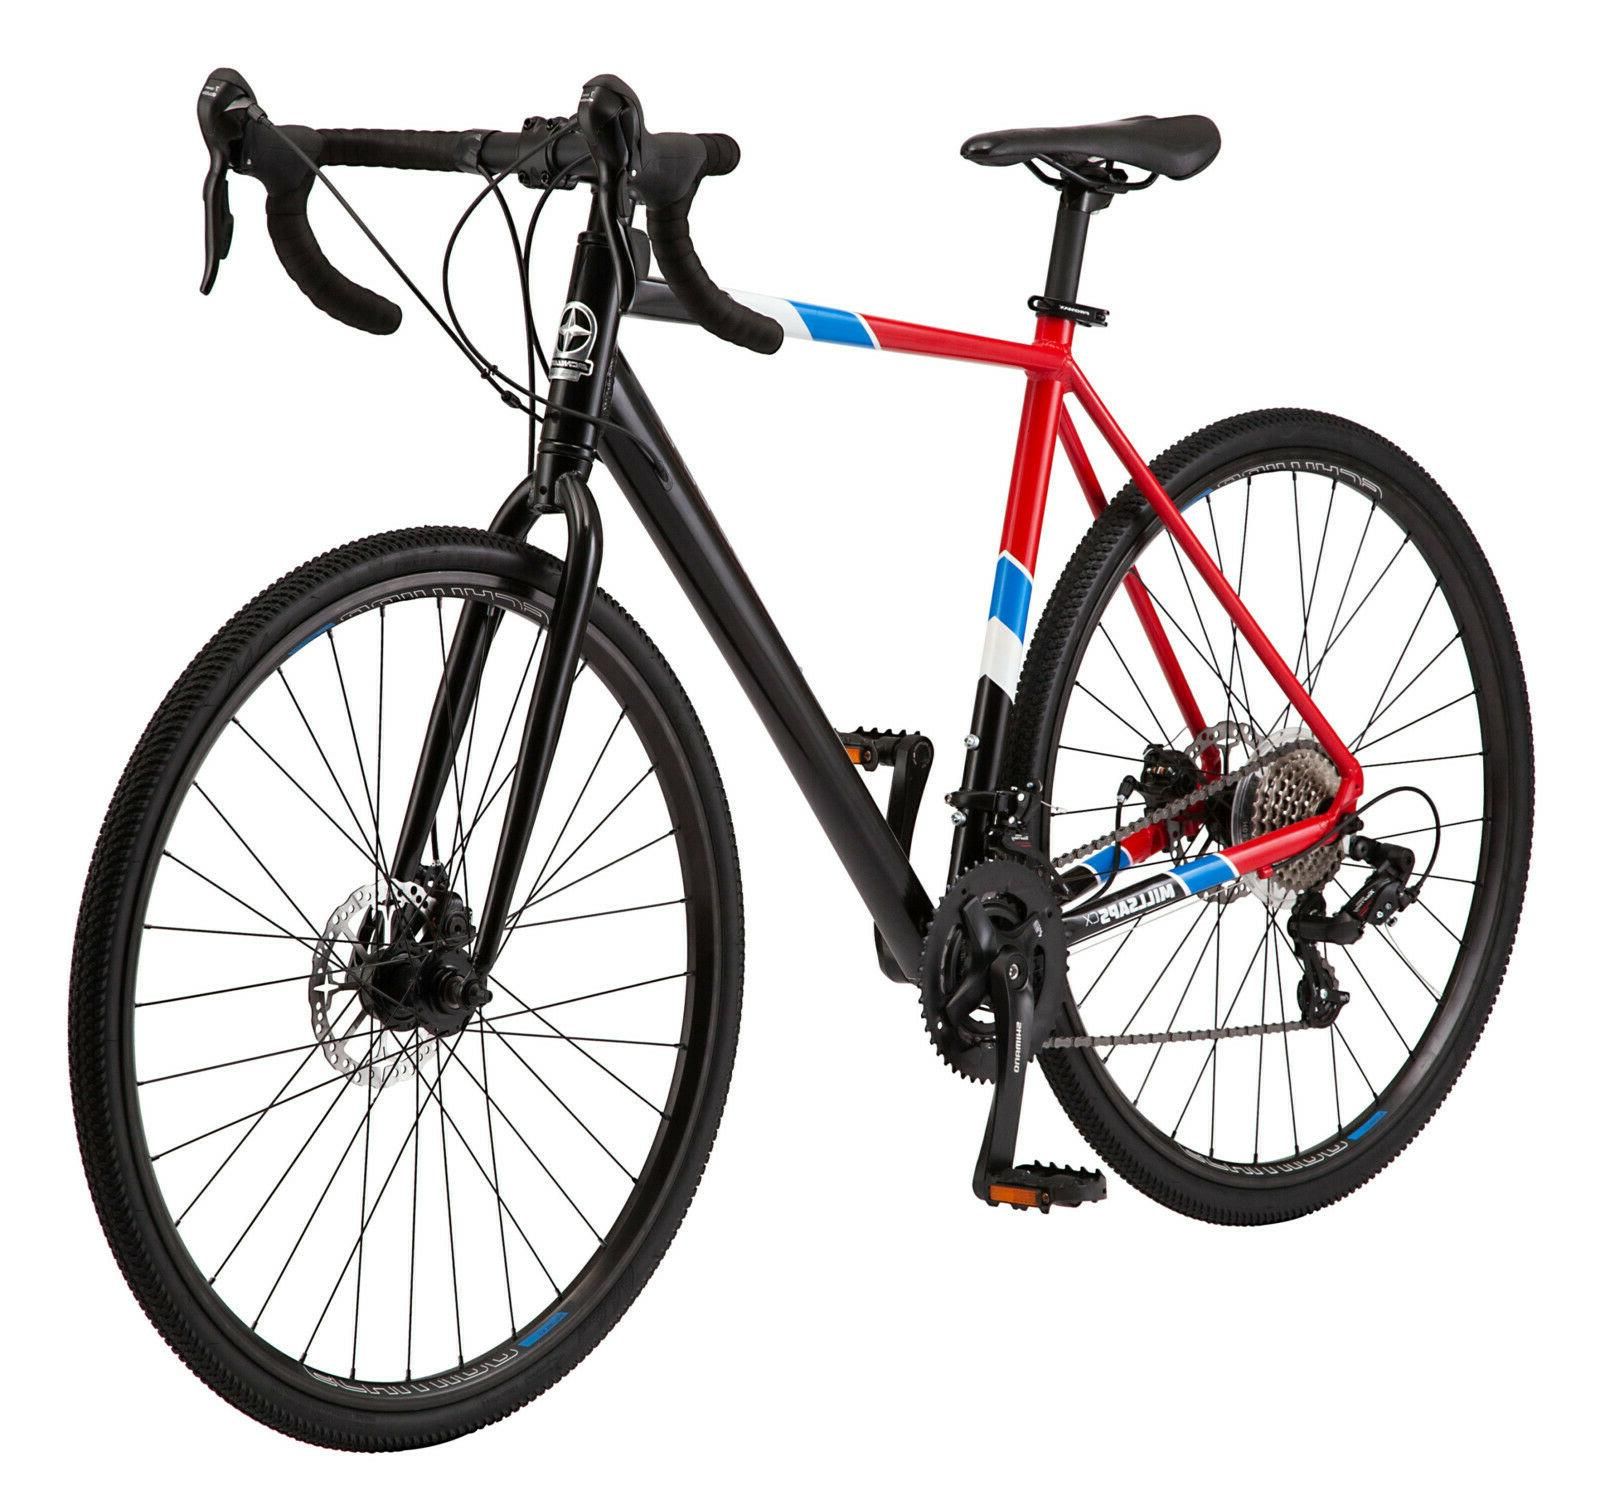 new millsaps road bike 700c wheels 14